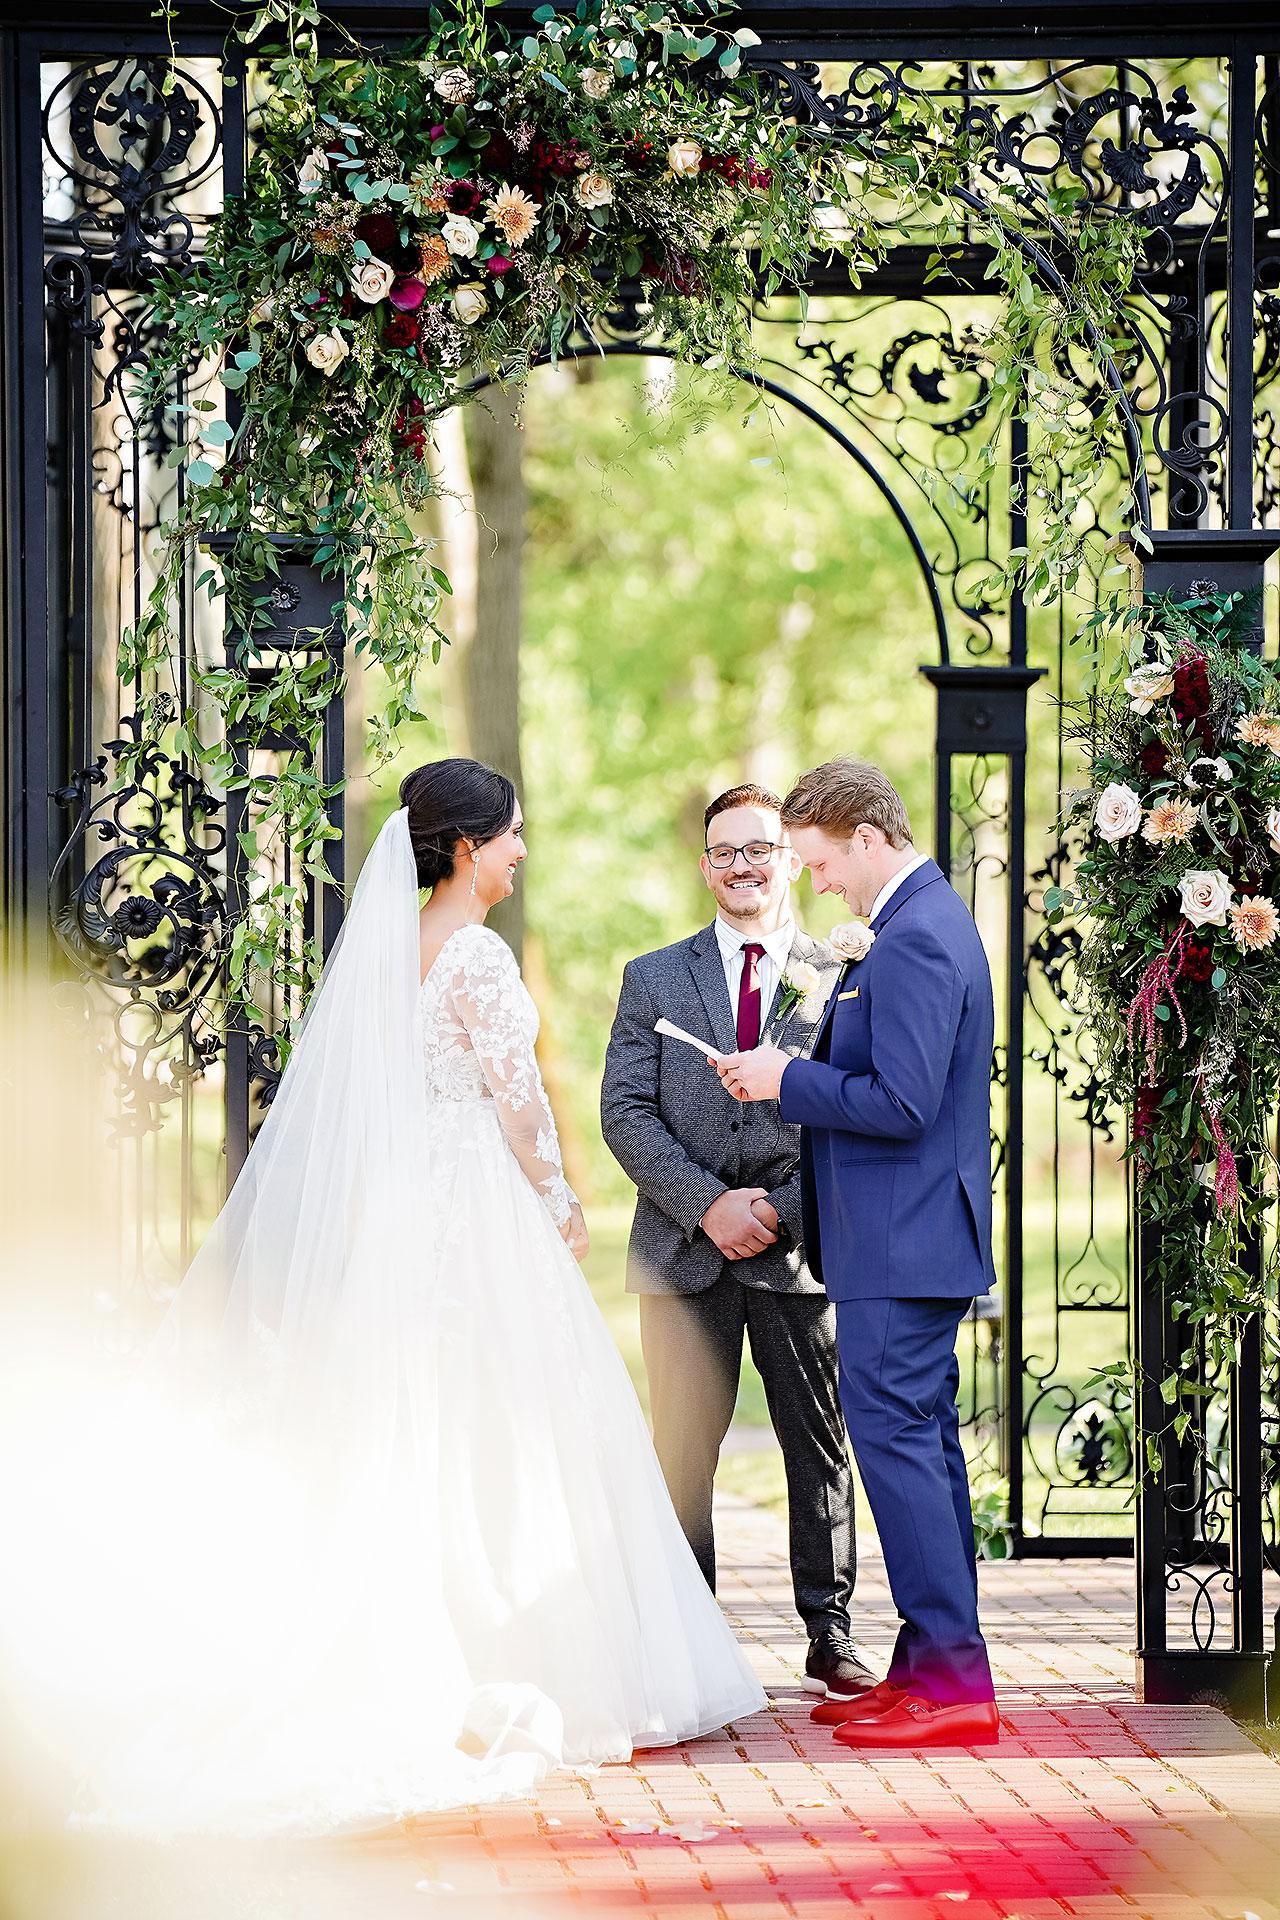 Nadia Parker Black Iris Estate Carmel Indiana Wedding May 2021 180